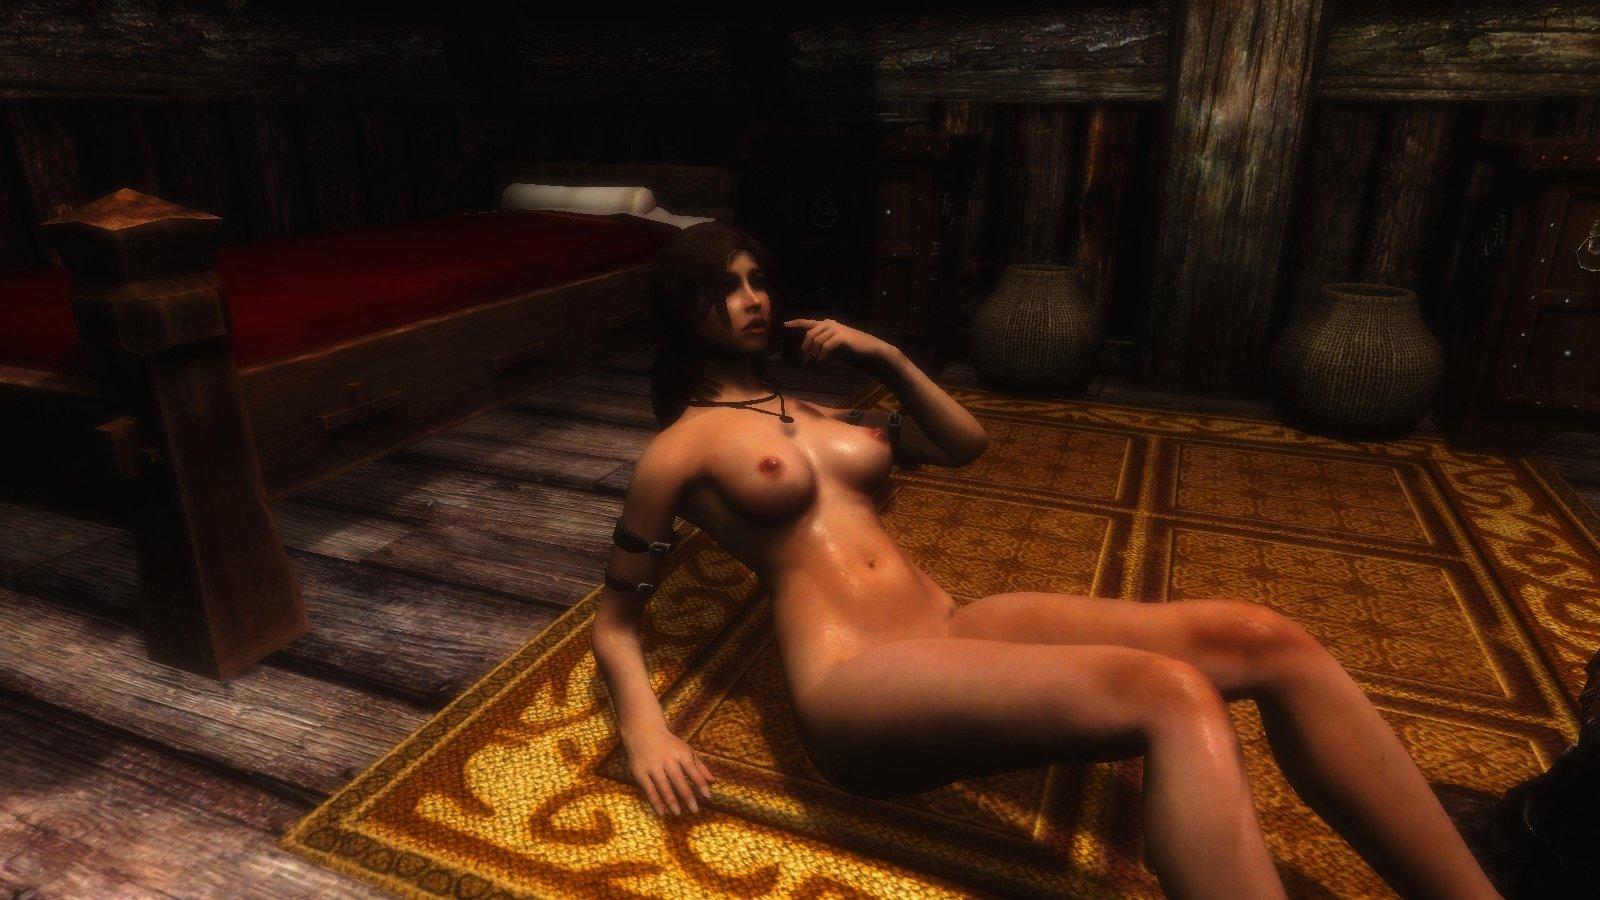 Похоже, Ларка прилегла на коврик..